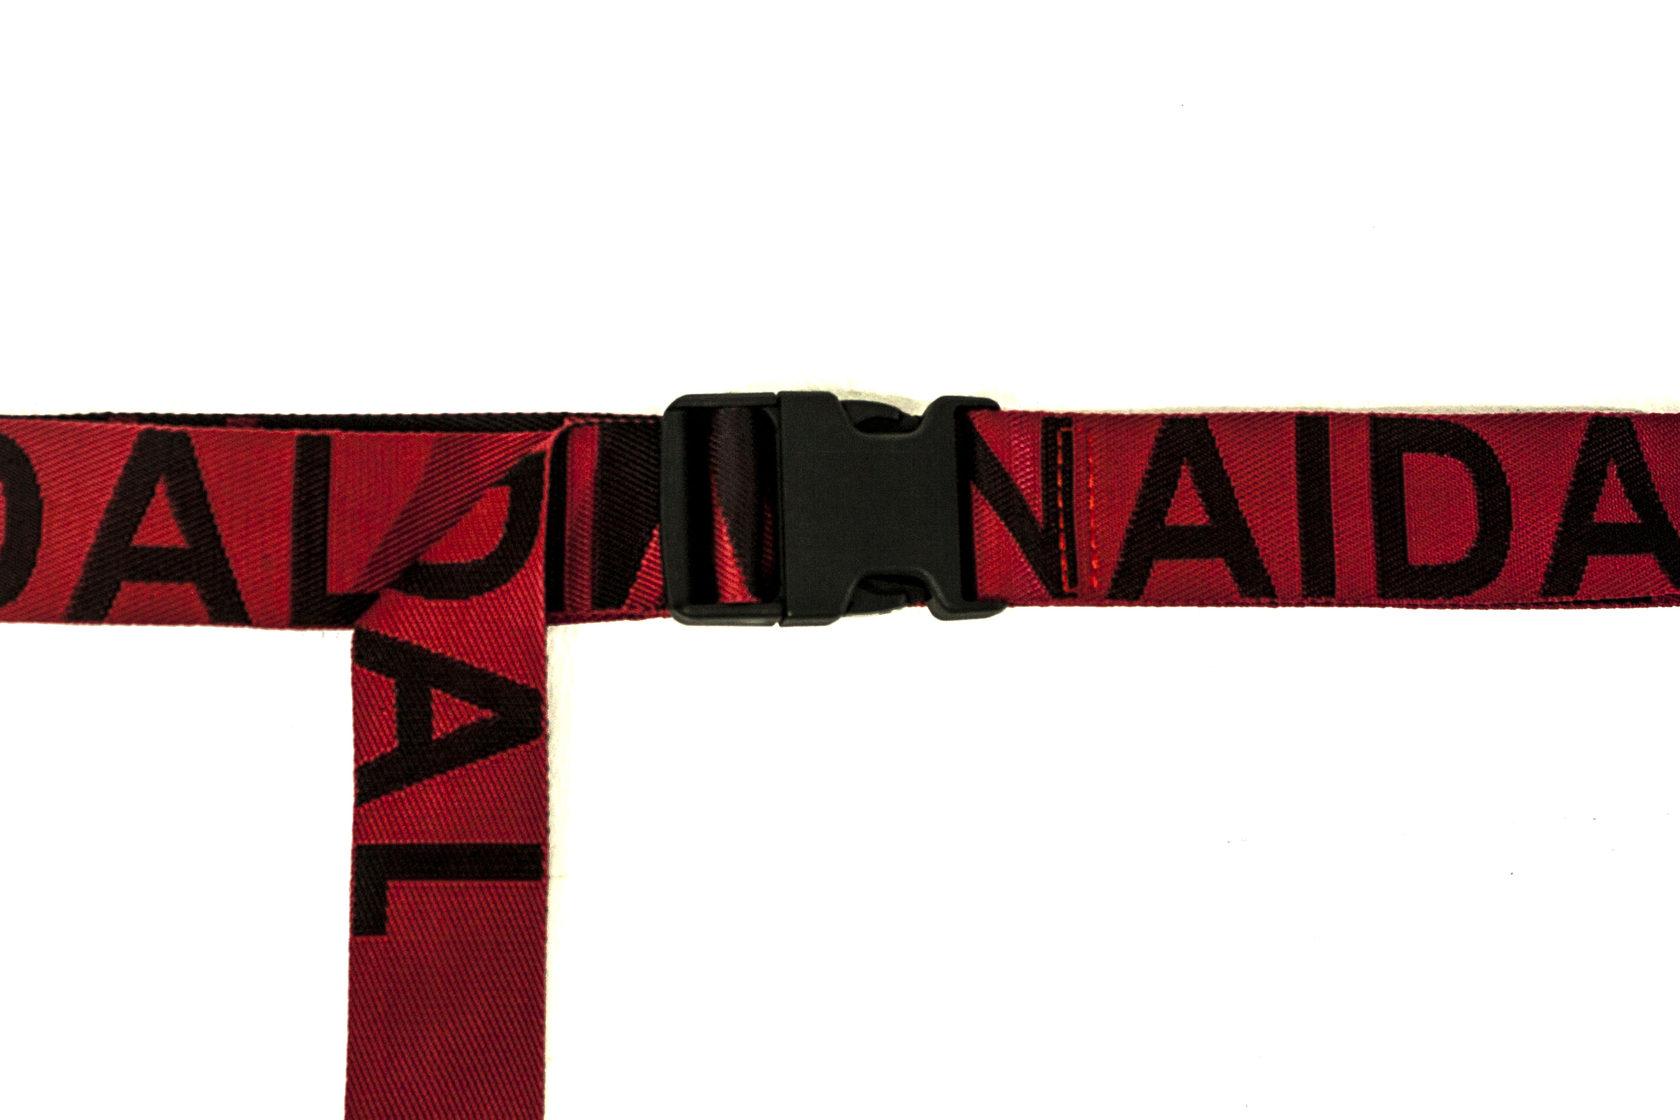 Belt online store